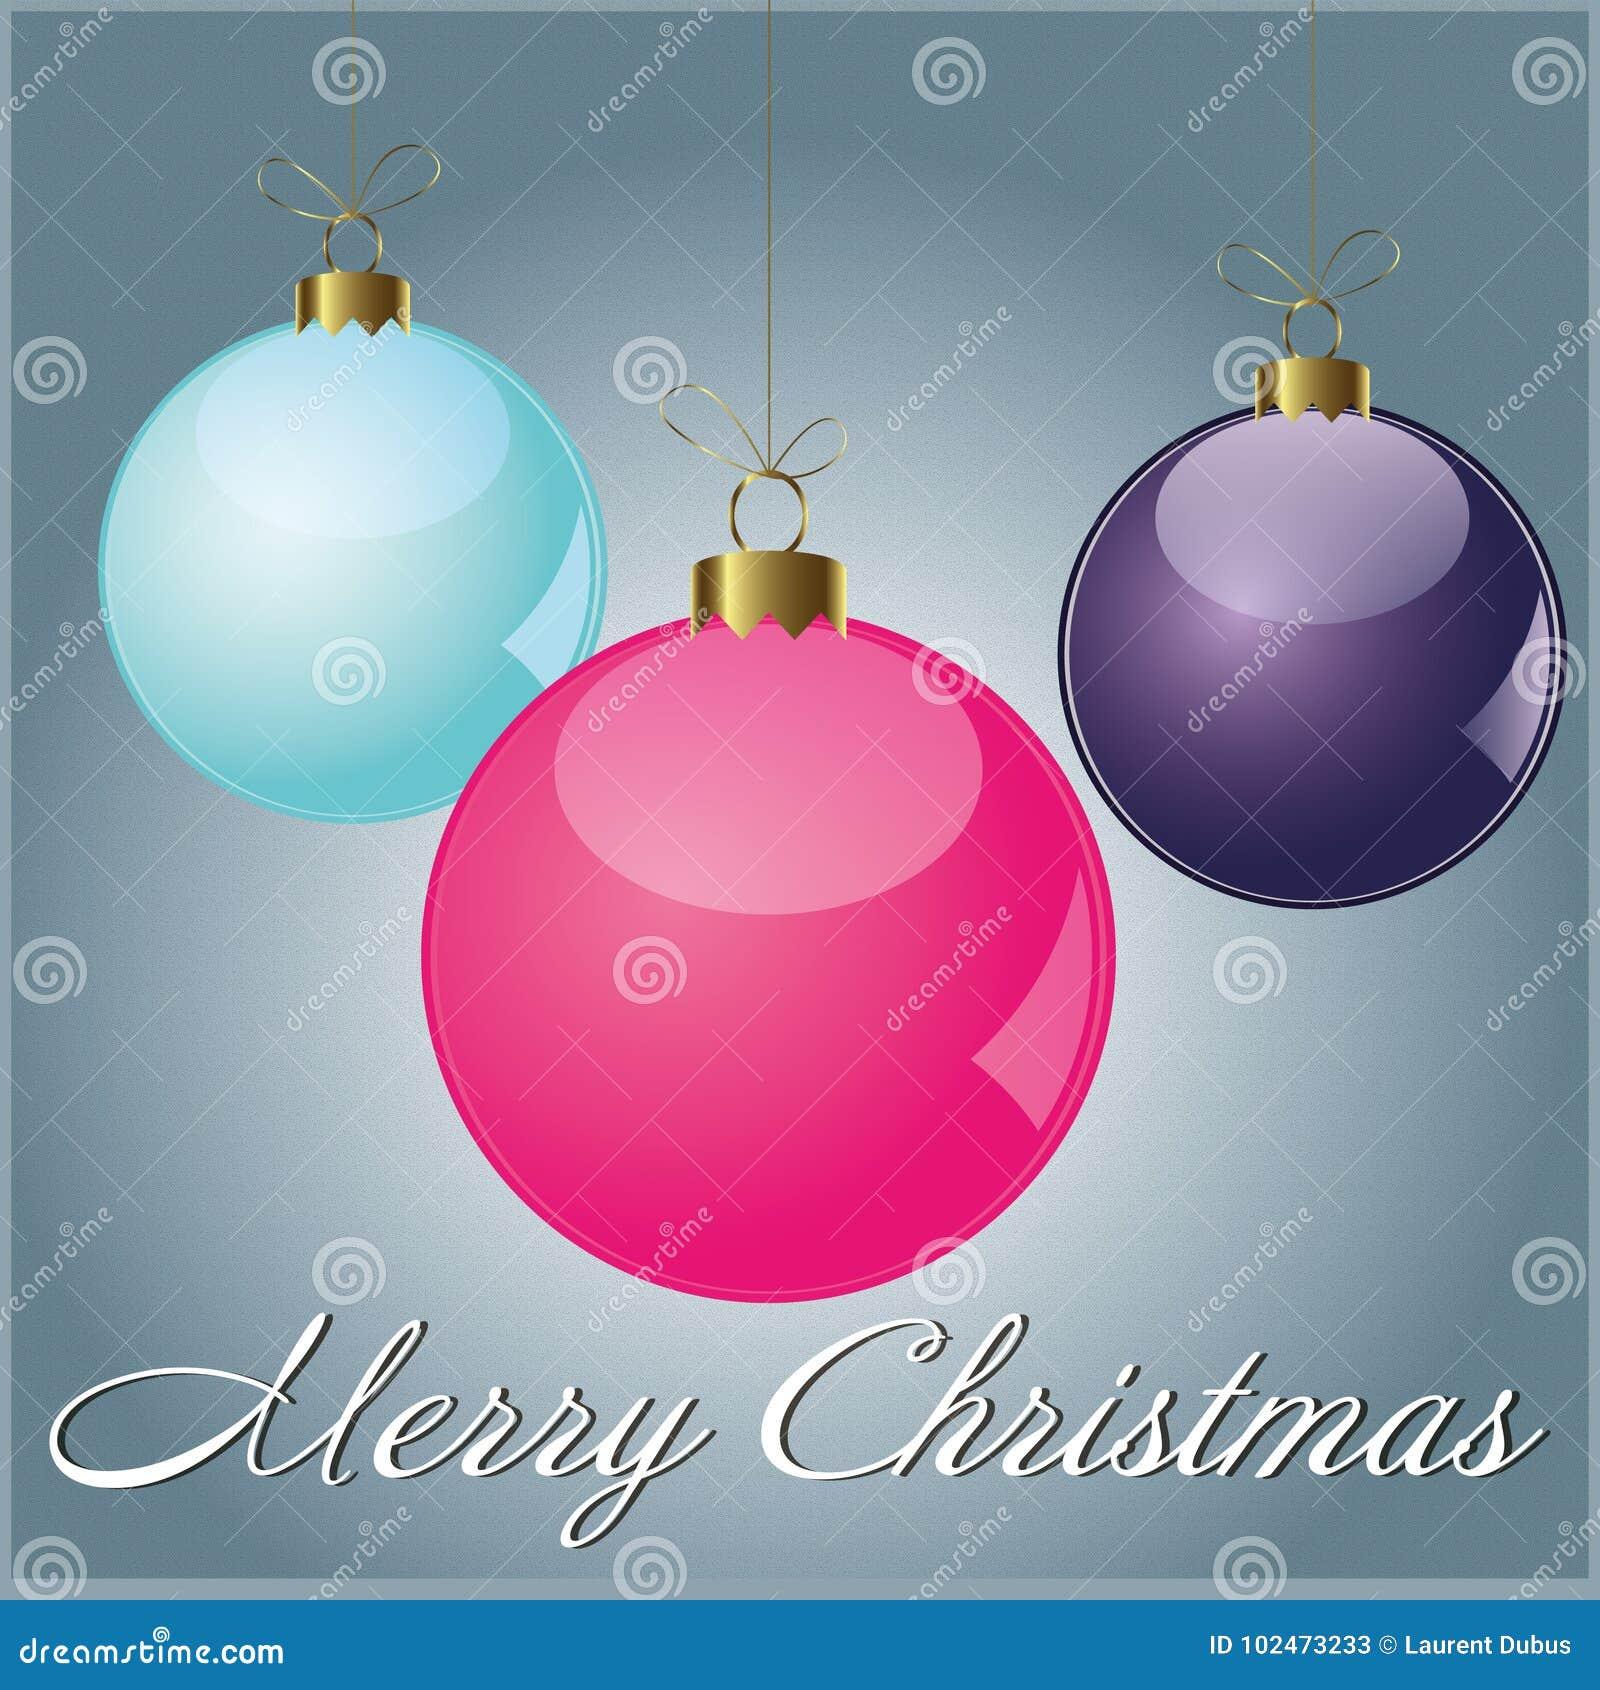 Card Merry Christmas Ball